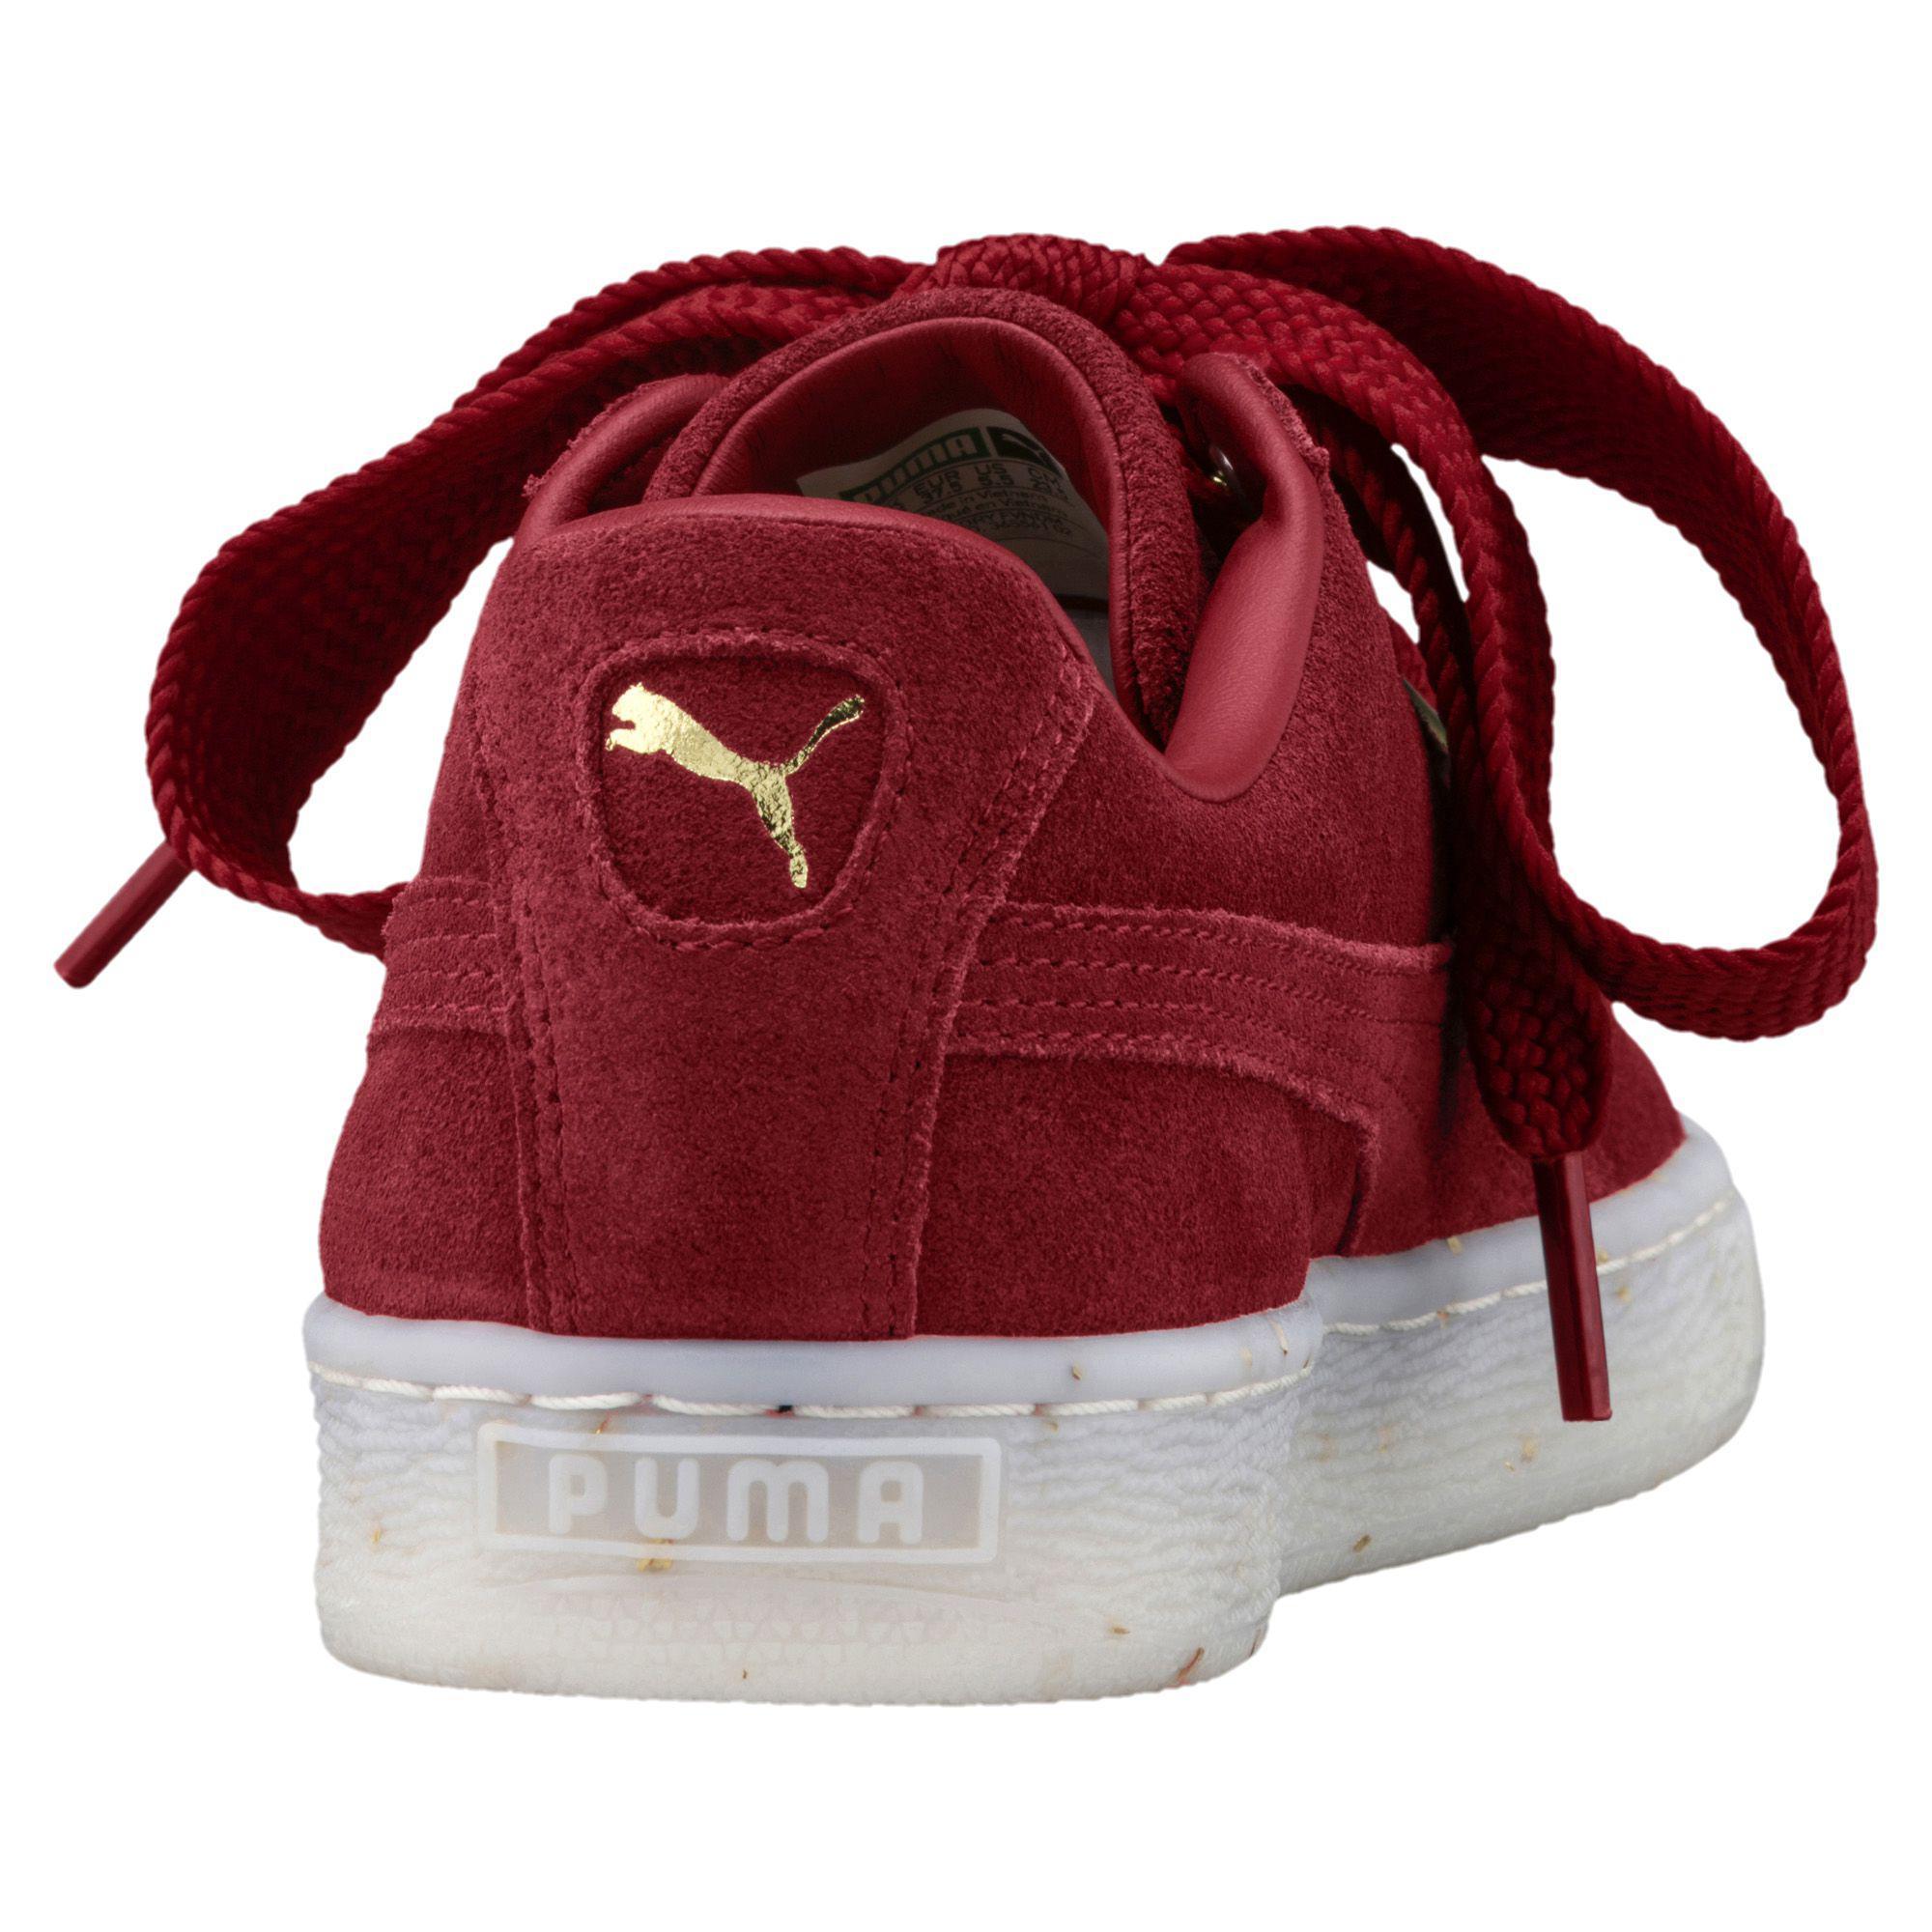 a4b448d7baa Lyst - PUMA  s Suede Heart Celebrate Sneaker in Red - Save 40%